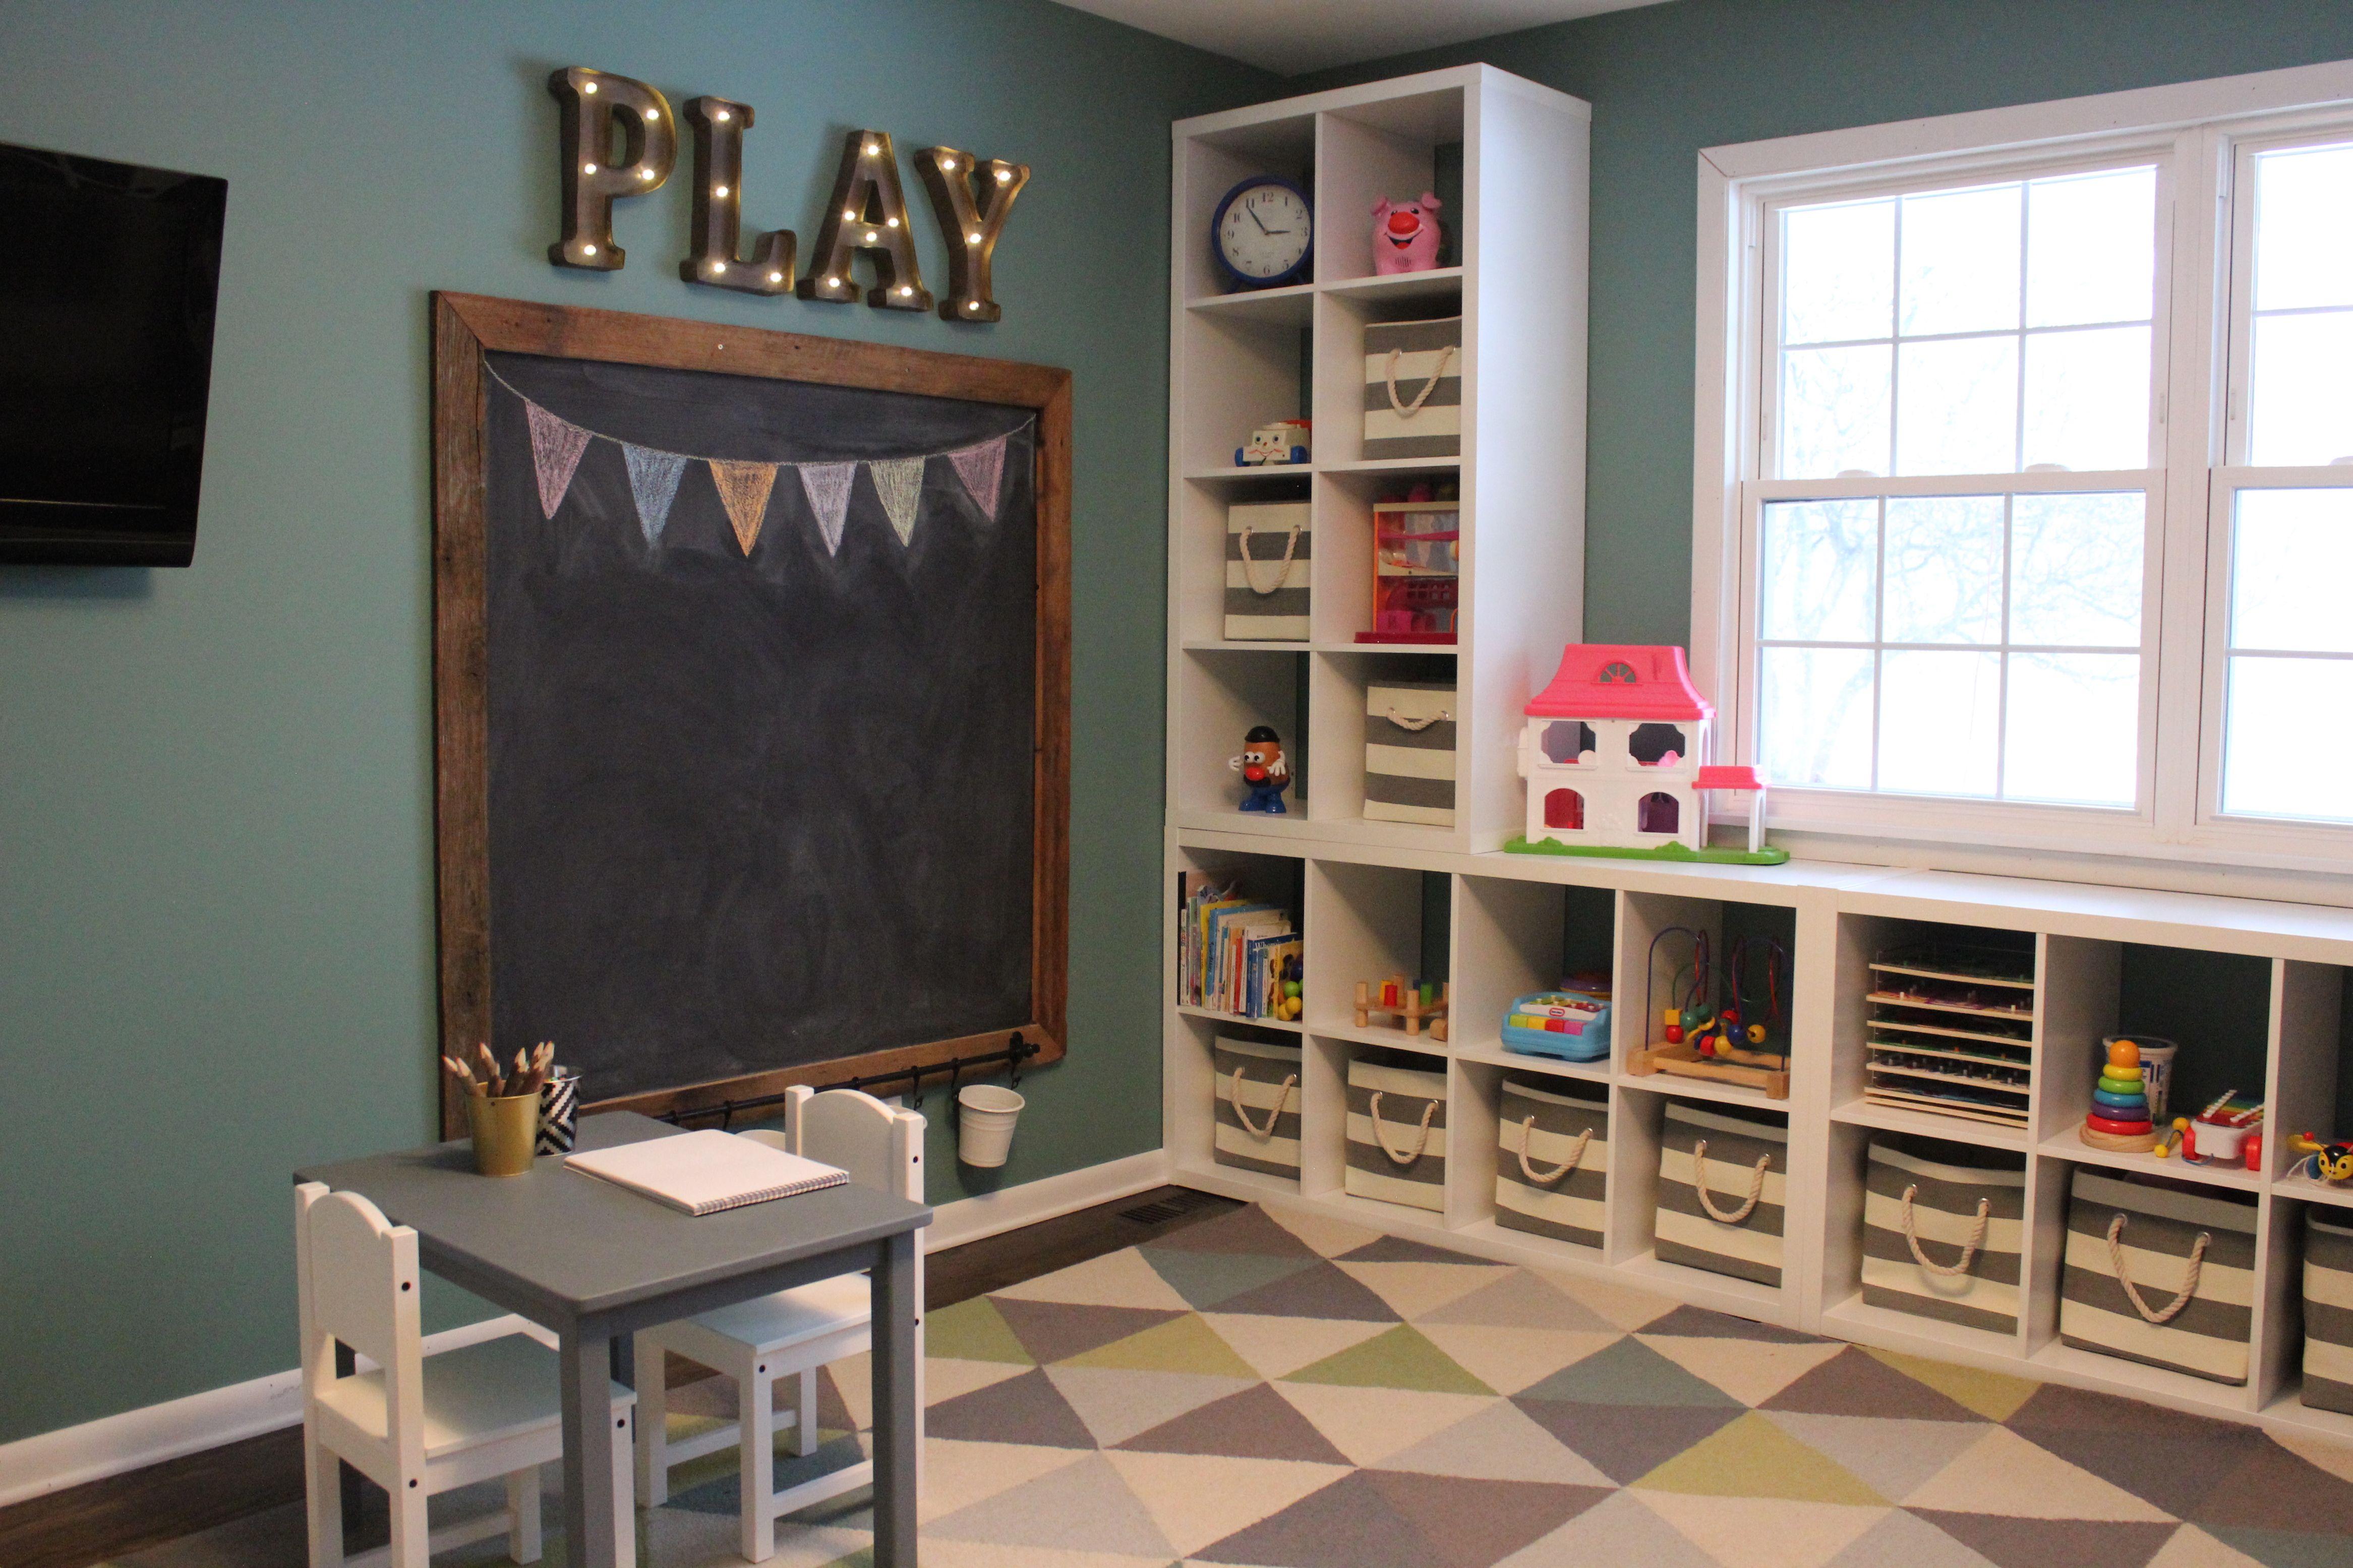 Playroom Chalkboard Marquee Letters Ikea Kallax Shelves Toy